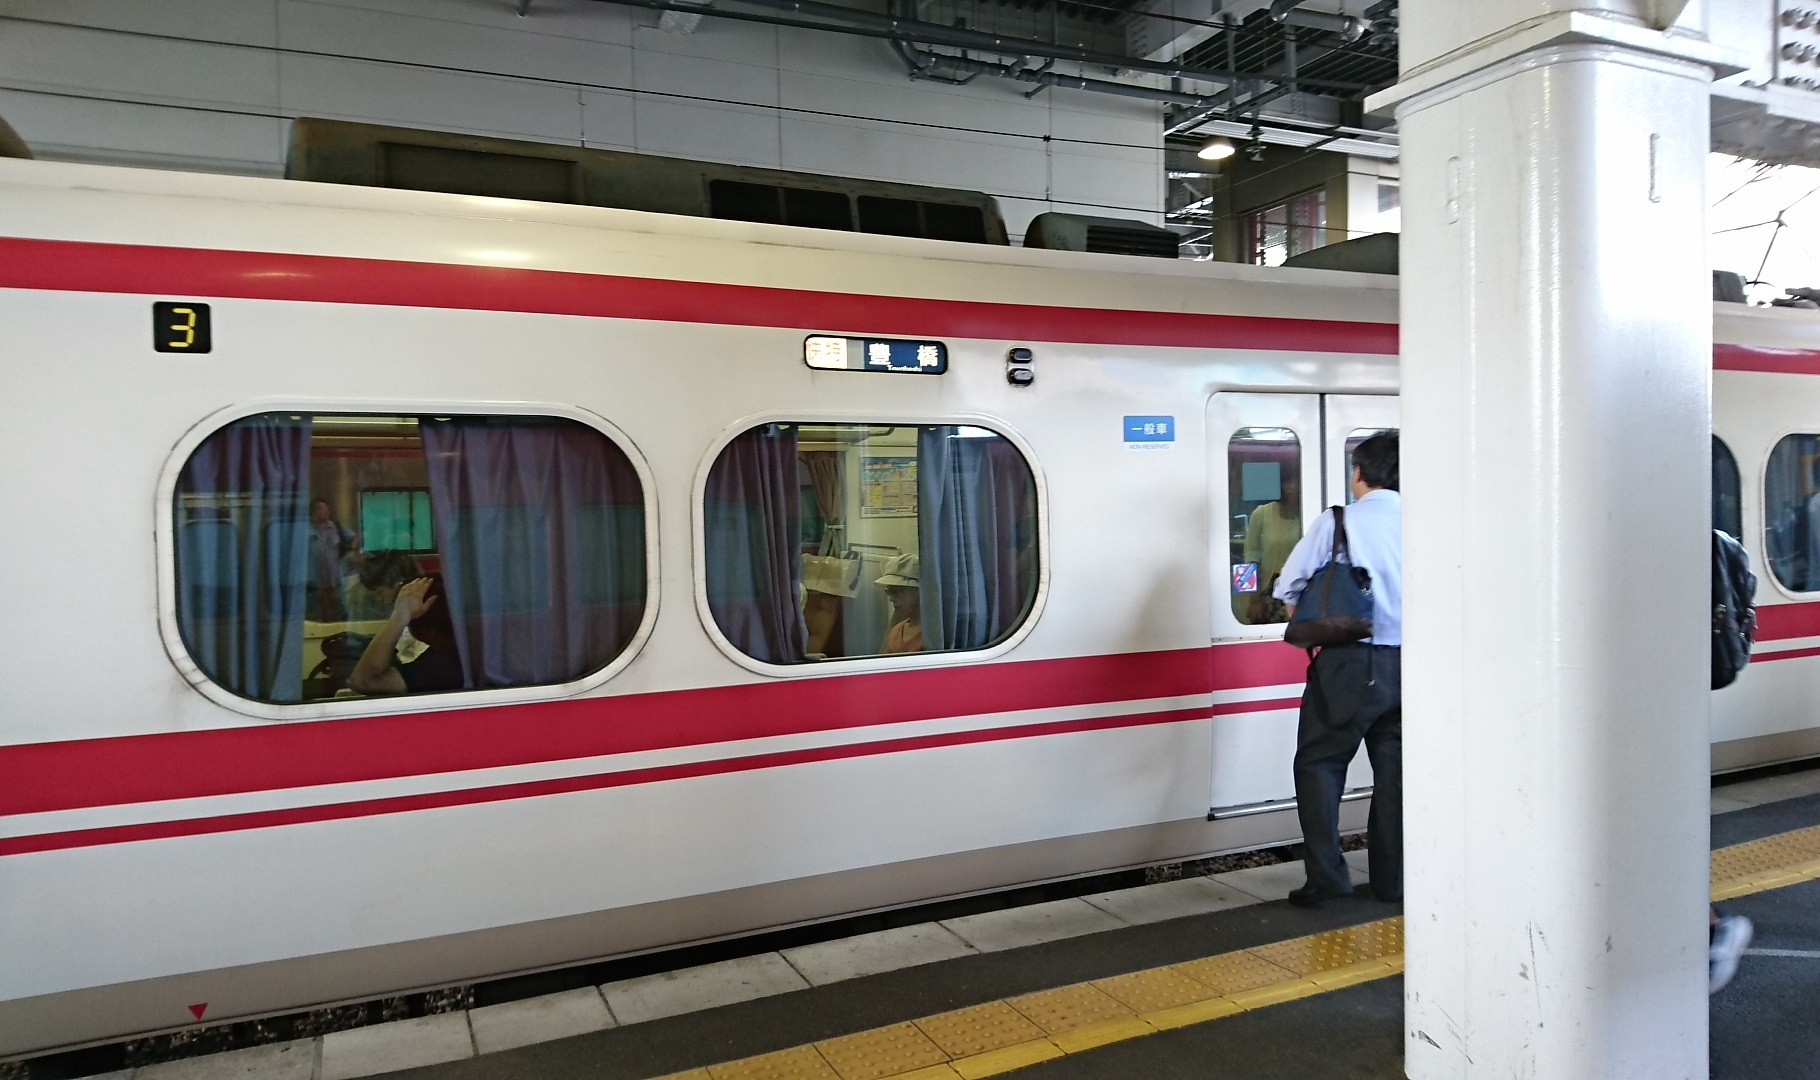 2017.8.30 豊川 (4) 東岡崎 - 豊橋いき快速特急 1820-1080